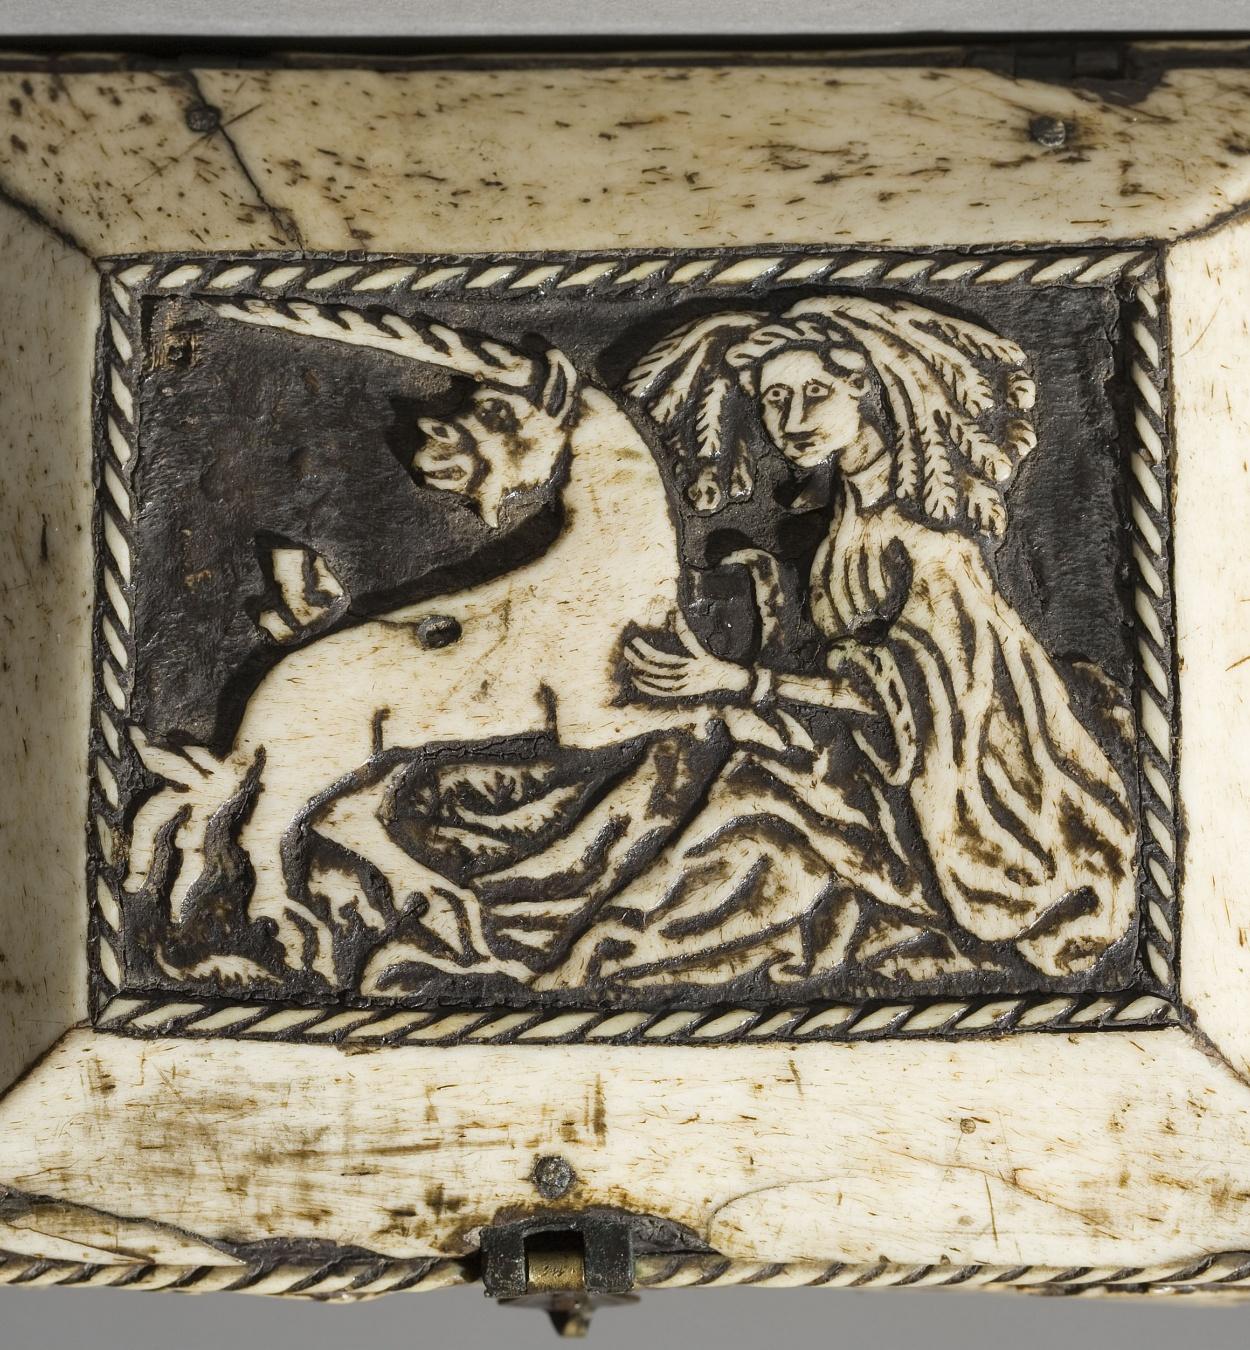 Anònim. França - Capseta amatòria amb dama i unicorn - Segle XV [4]